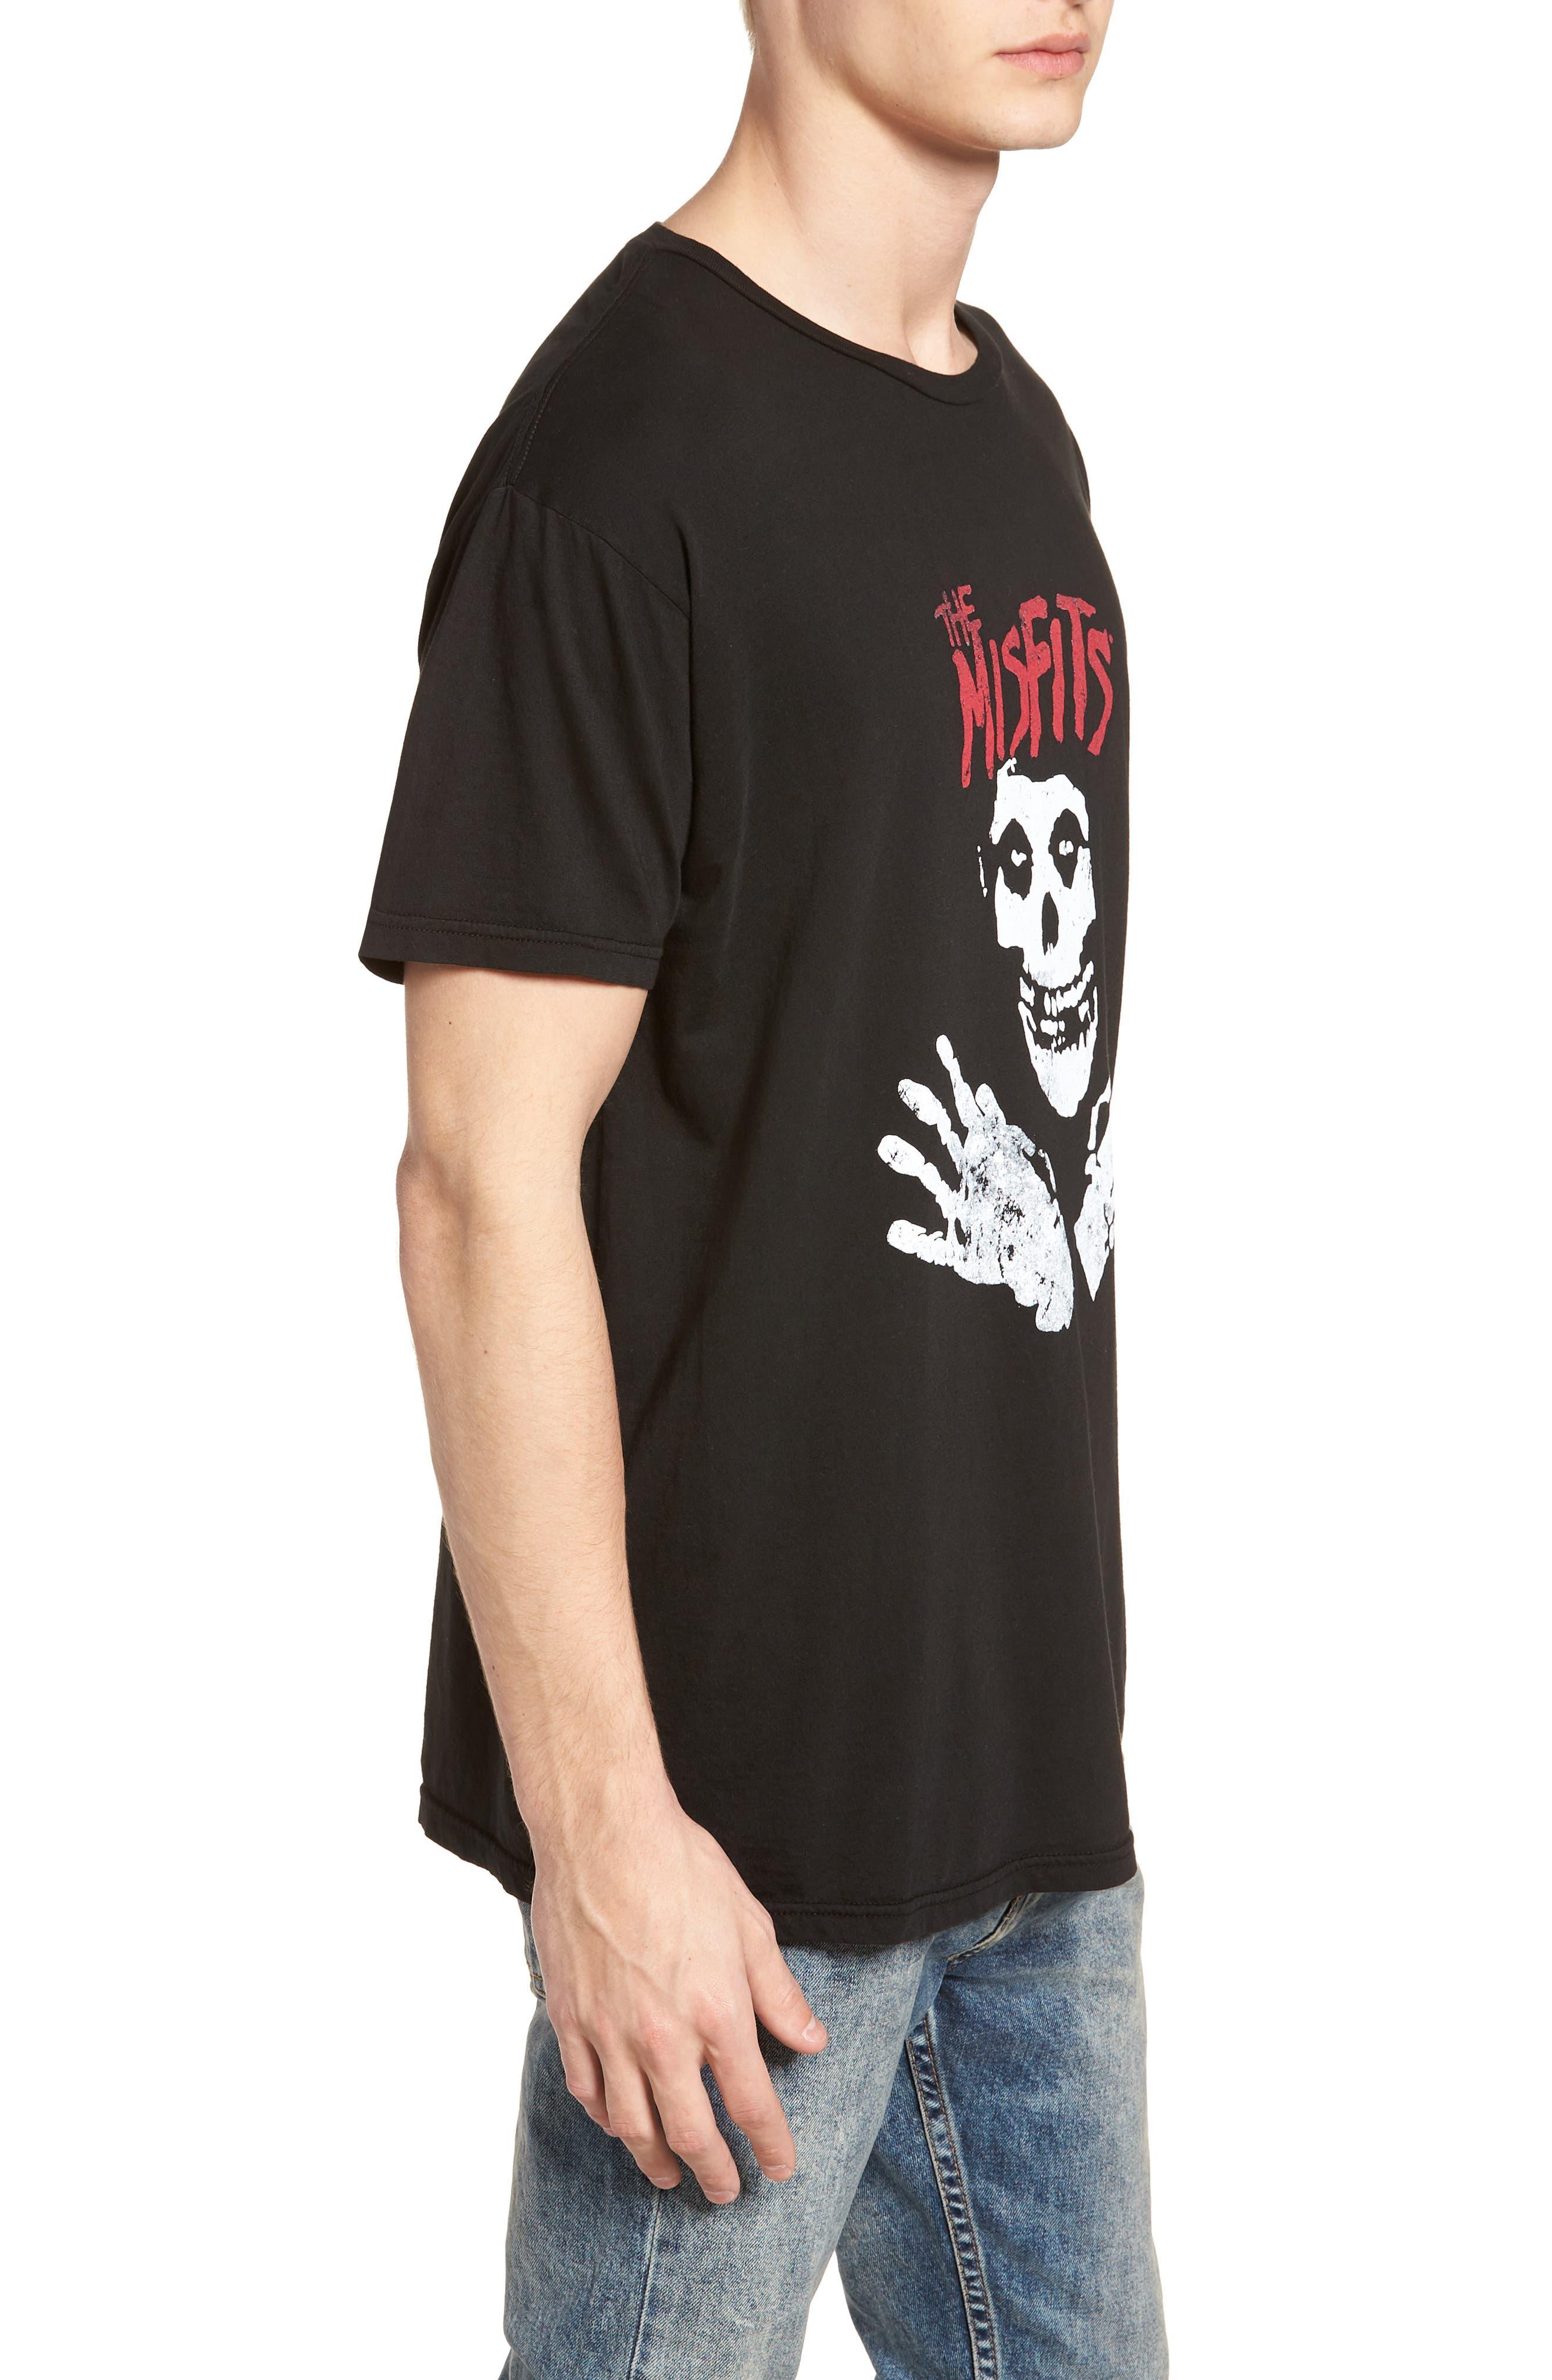 Misfits Graphic T-Shirt,                             Alternate thumbnail 3, color,                             Black